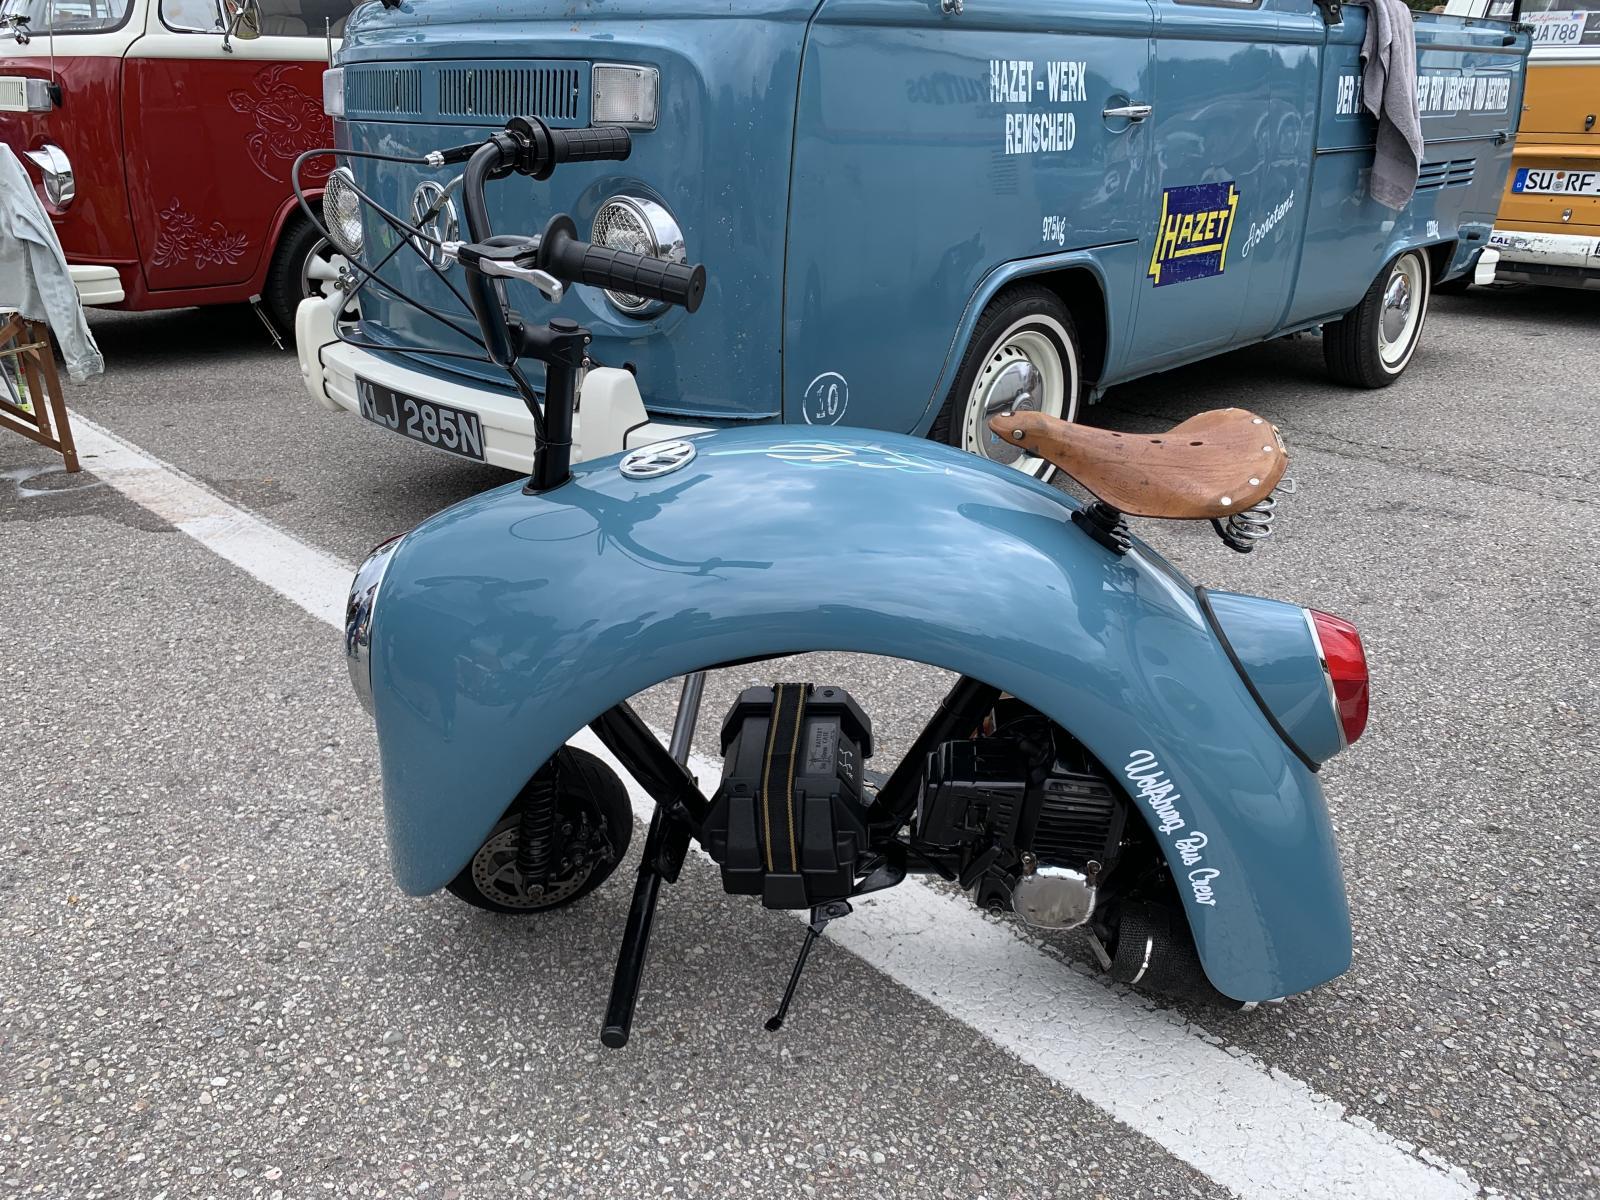 some interesting vw vehicles